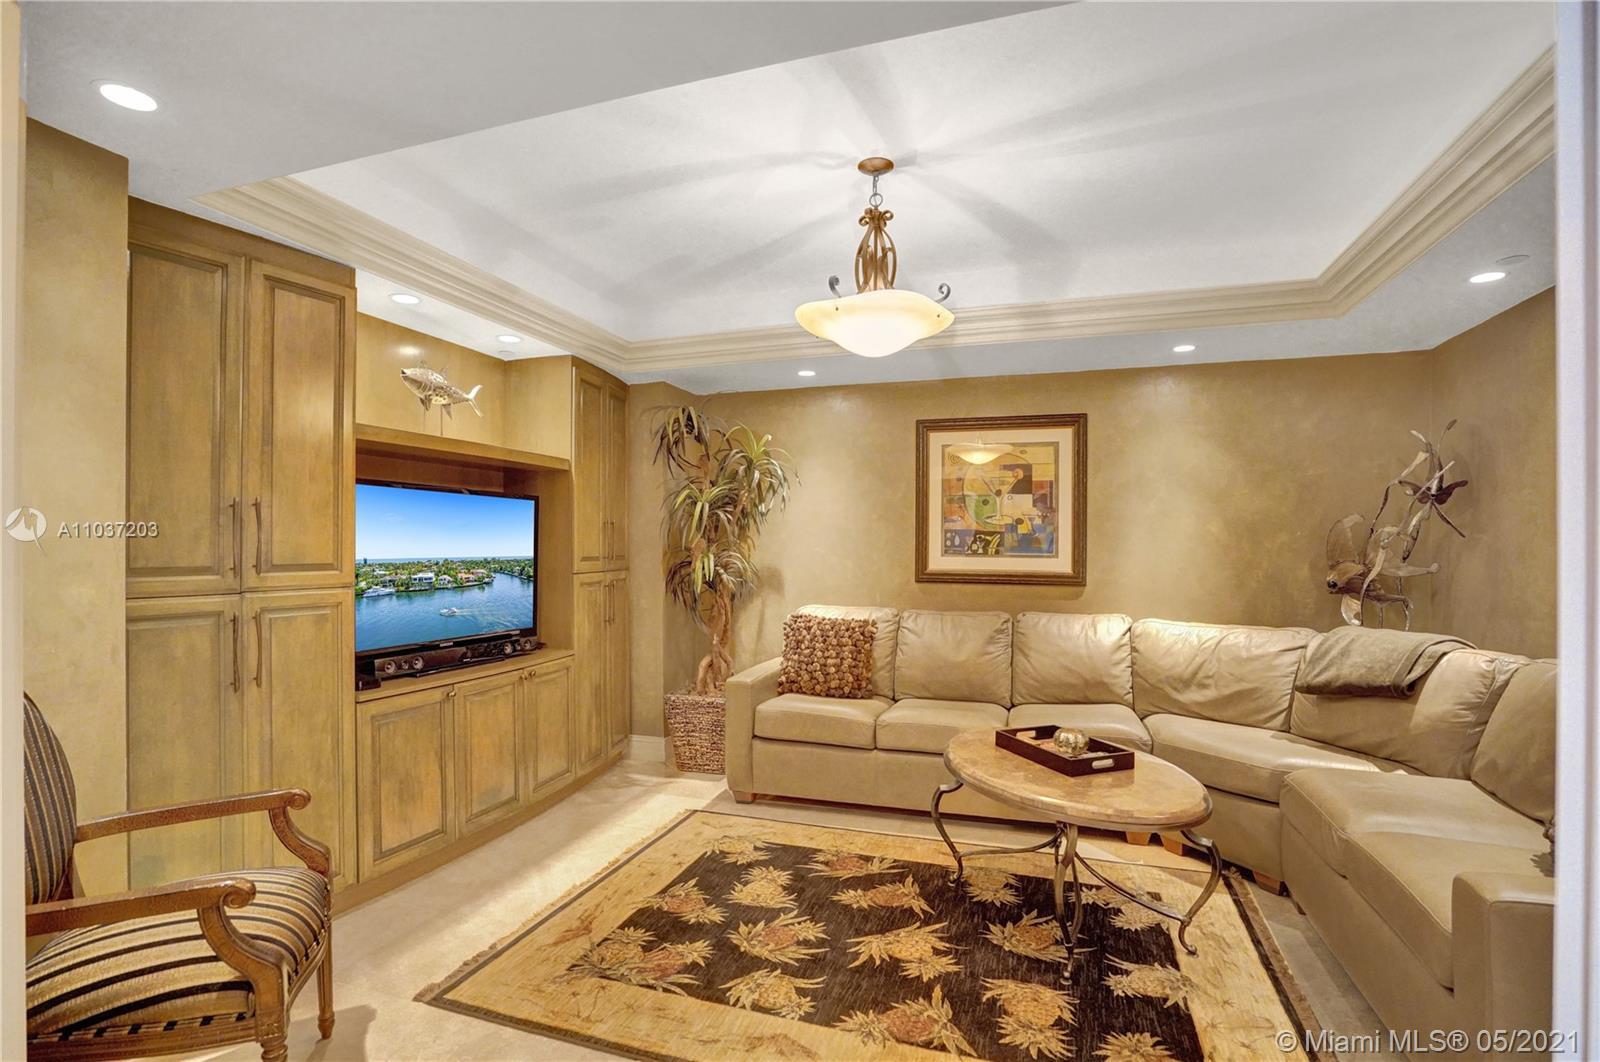 Photo of 20201 Country Club Dr #1006, Aventura, Florida, 33180 - Very spacious living room.